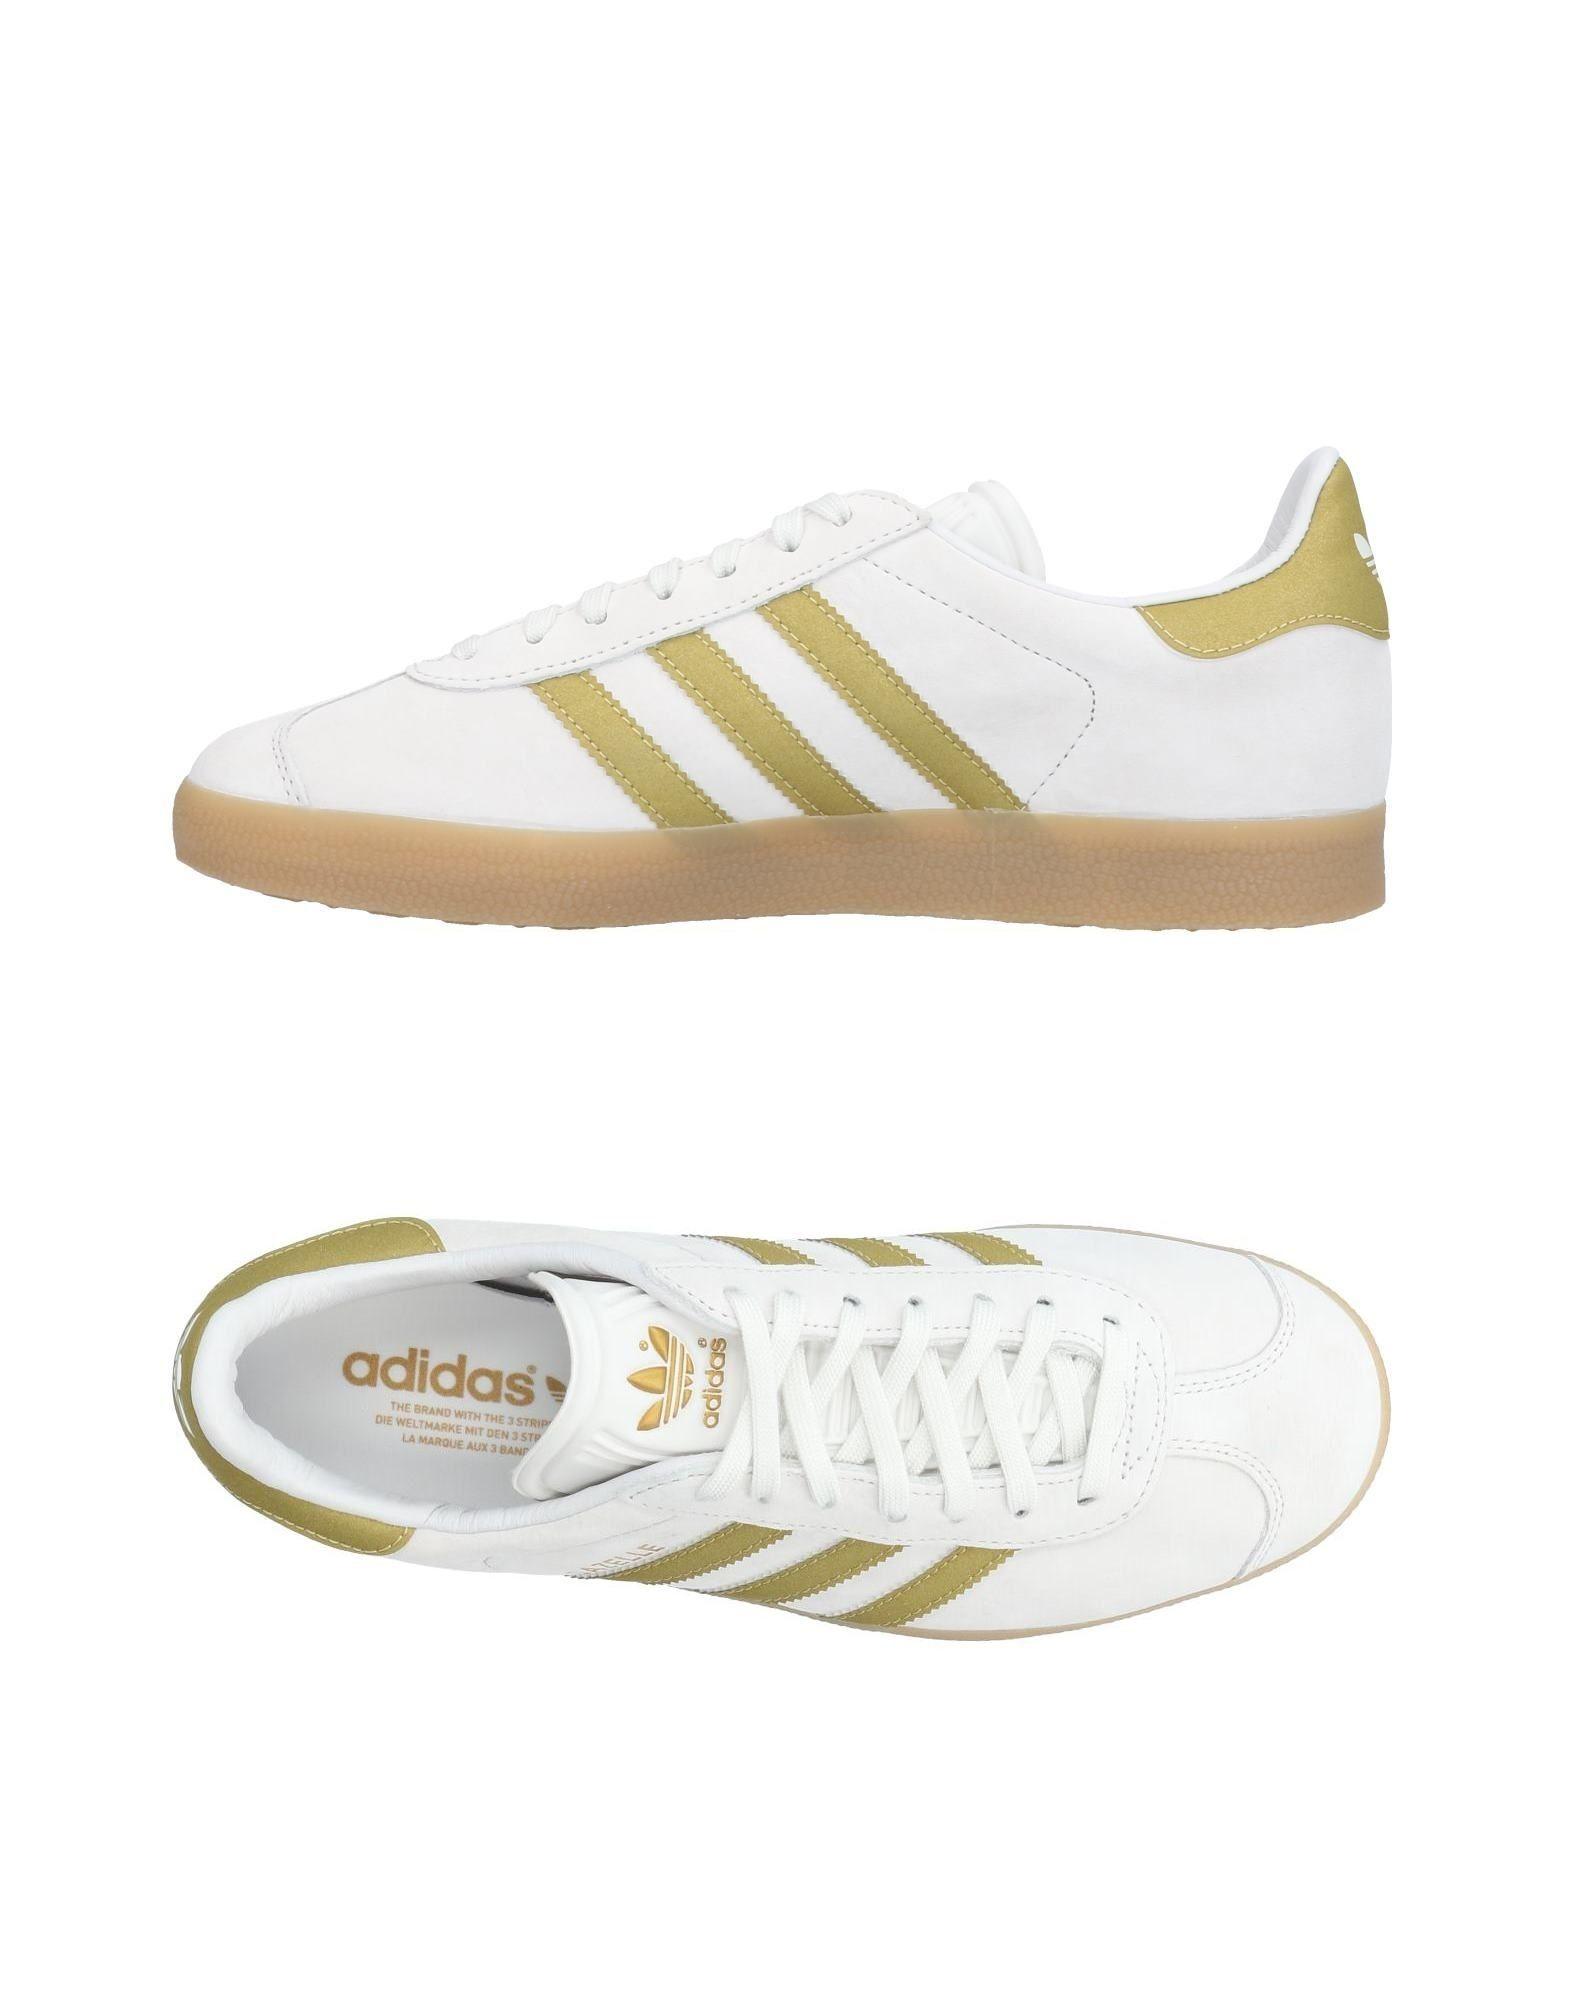 Sneakers Adidas Originals Donna - 11425210OQ 11425210OQ - f77fc1